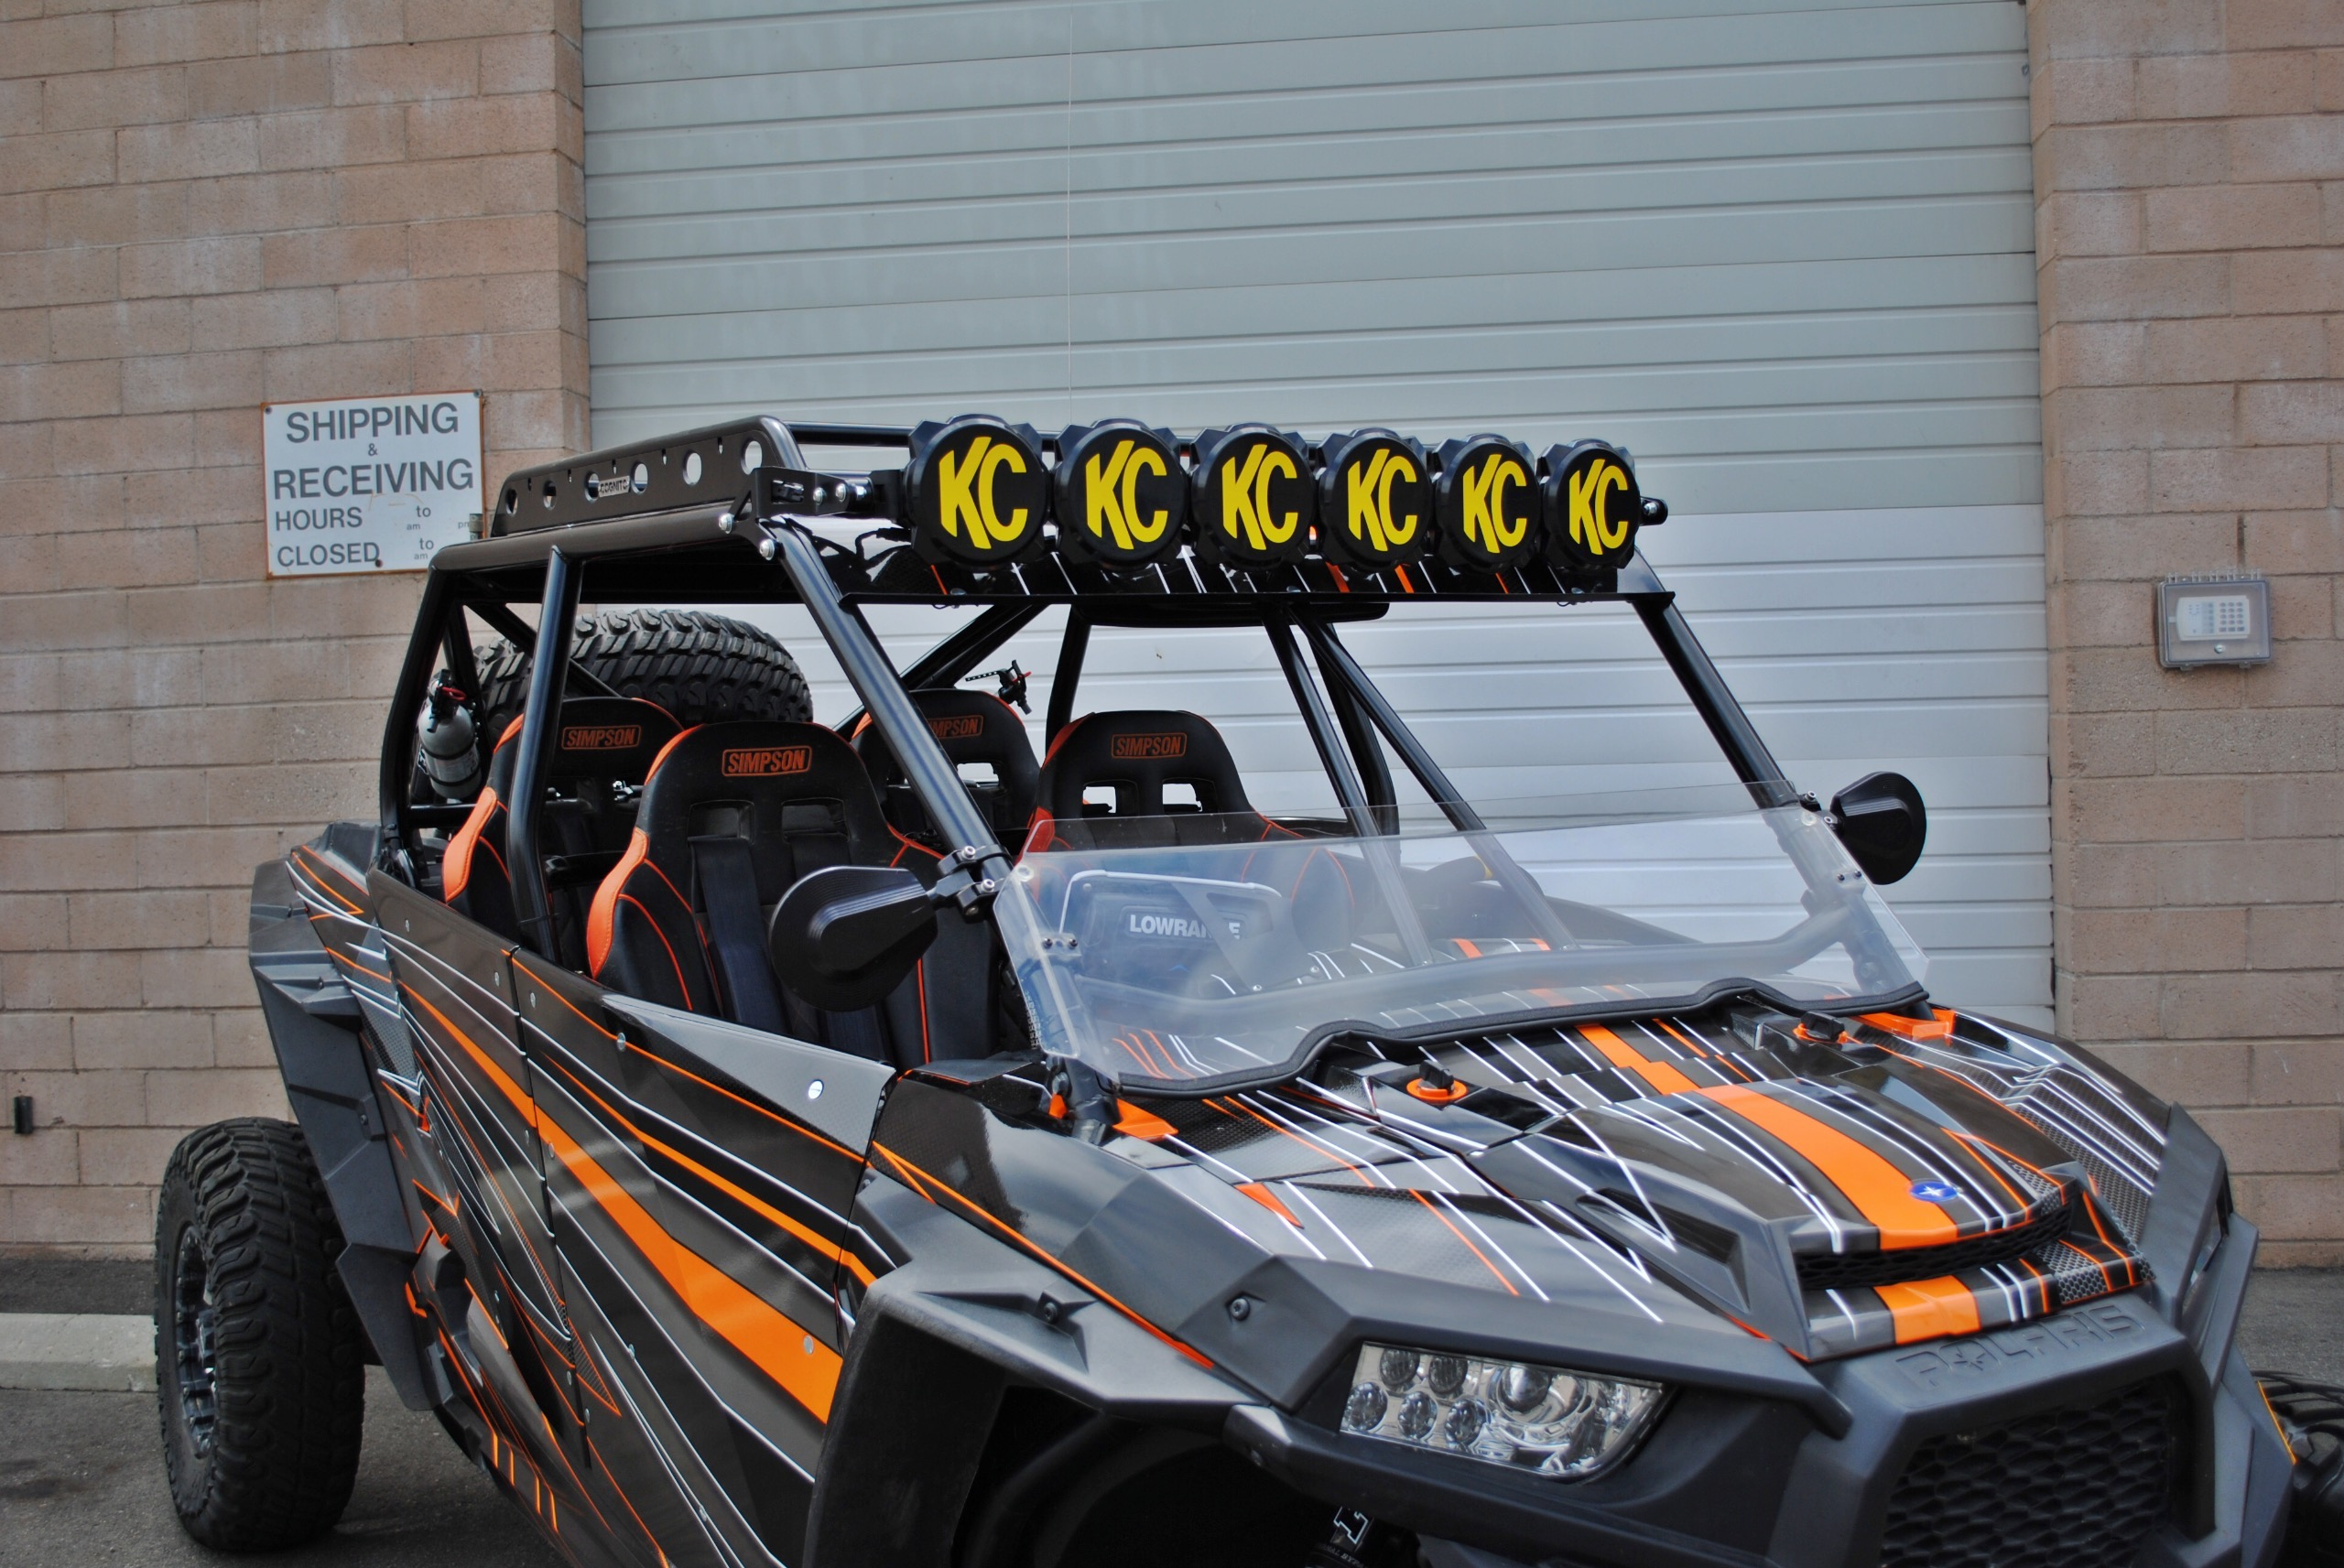 Cognito Motorsports Polaris Rzr 4 Seat Xp1000 Amp Xp Turbo